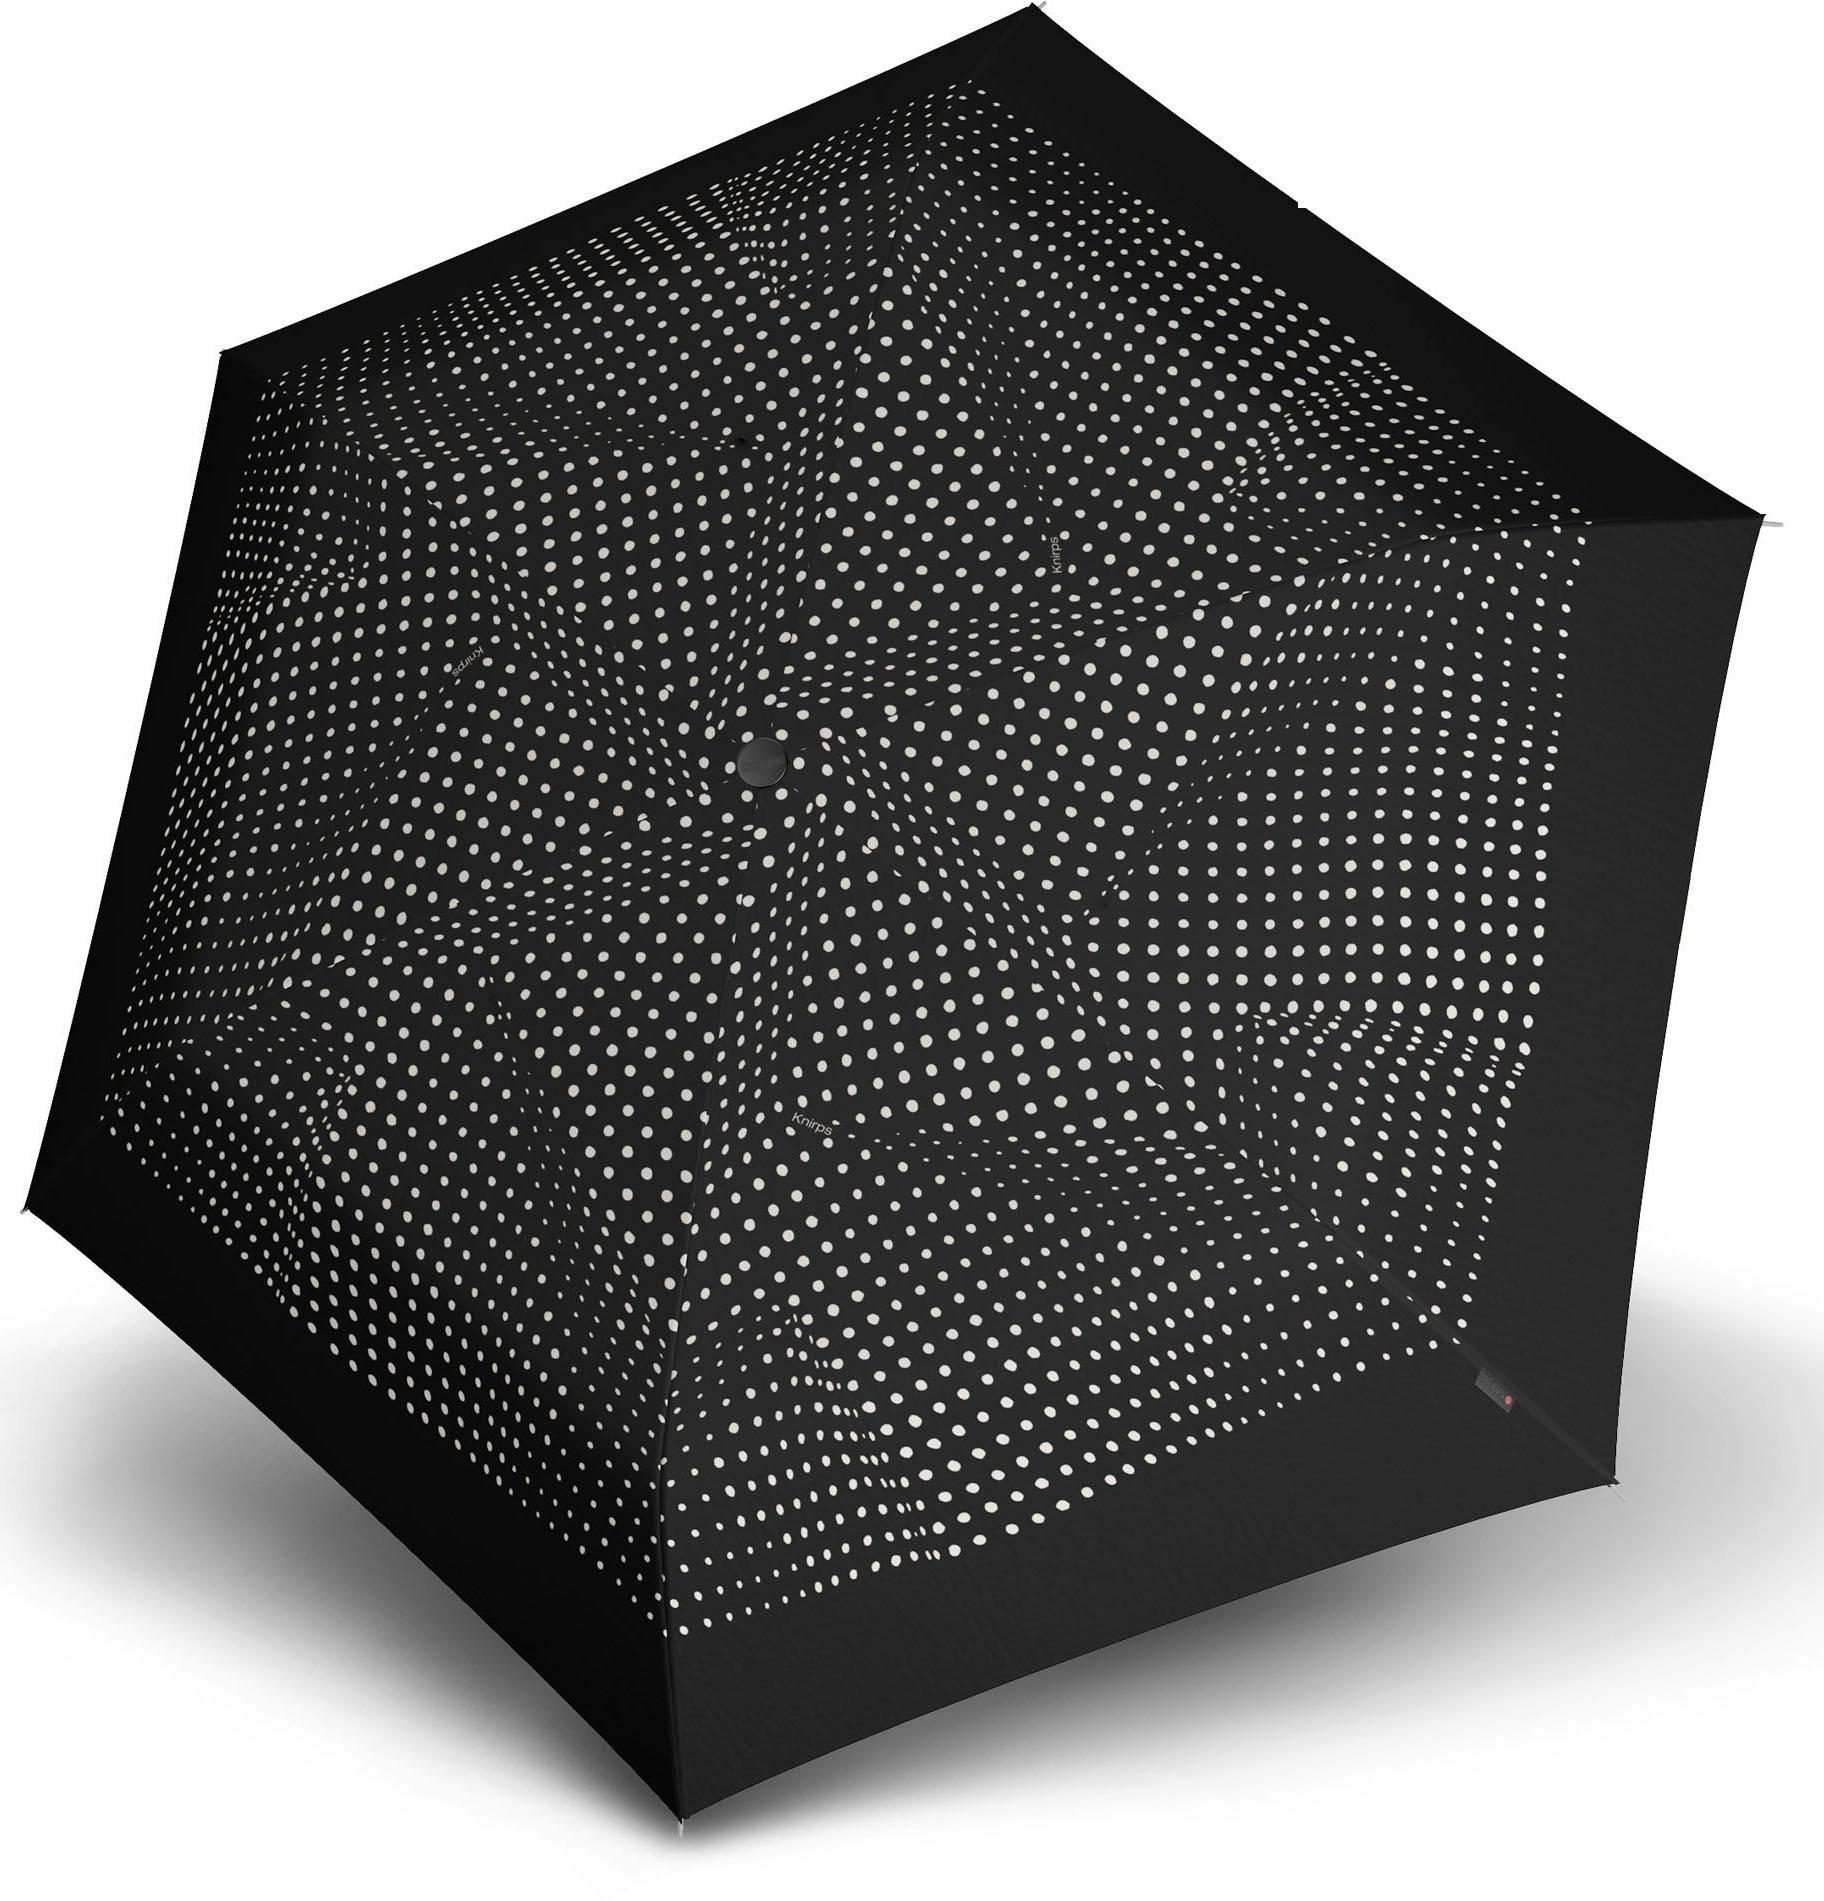 Knirps Taschenregenschirm ´´TS200 Slim Medium Duomatic bolero´´   Accessoires > Regenschirme > Sonstige Regenschirme   Schwarz   Wo   Knirps